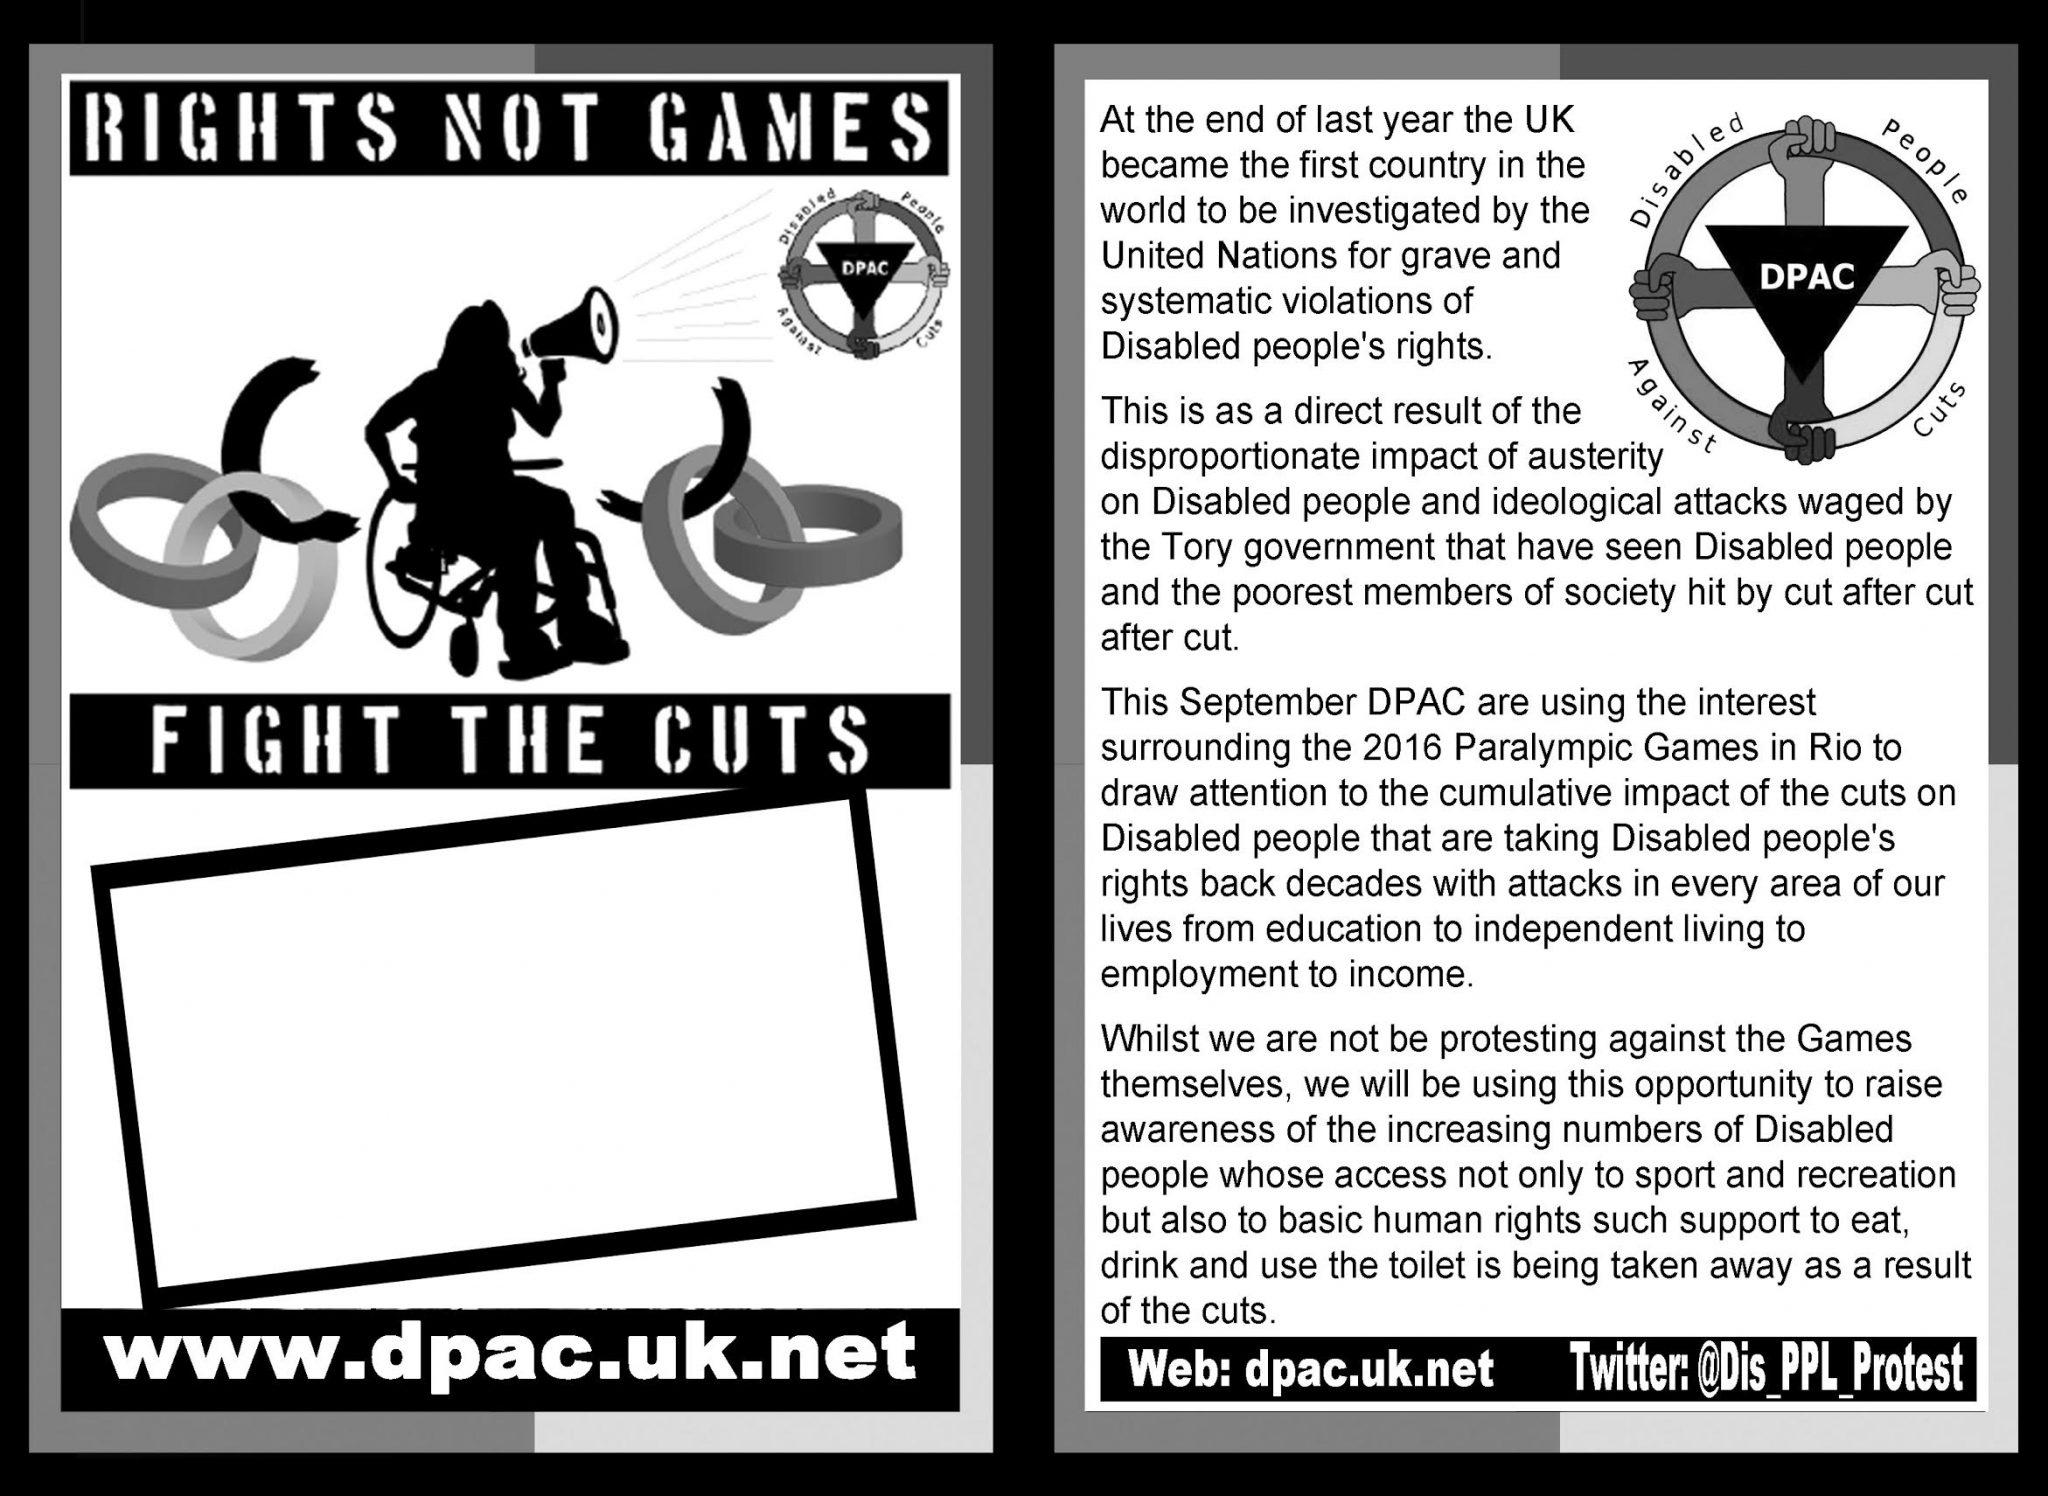 RightsnotGames leaflet